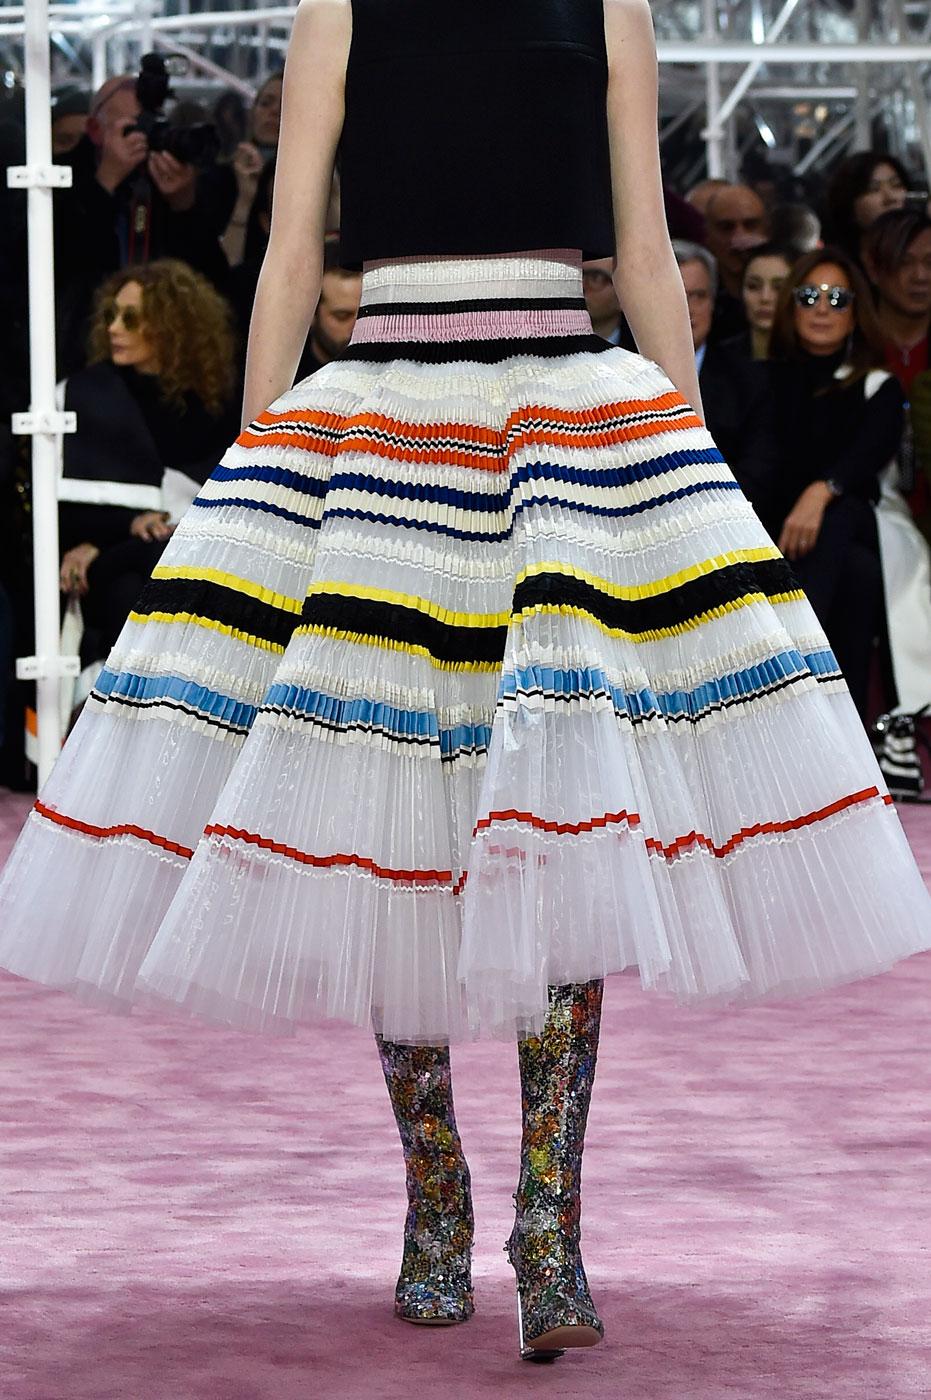 Christian-Dior-fashion-runway-show-close-ups-haute-couture-paris-spring-summer-2015-the-impression-149